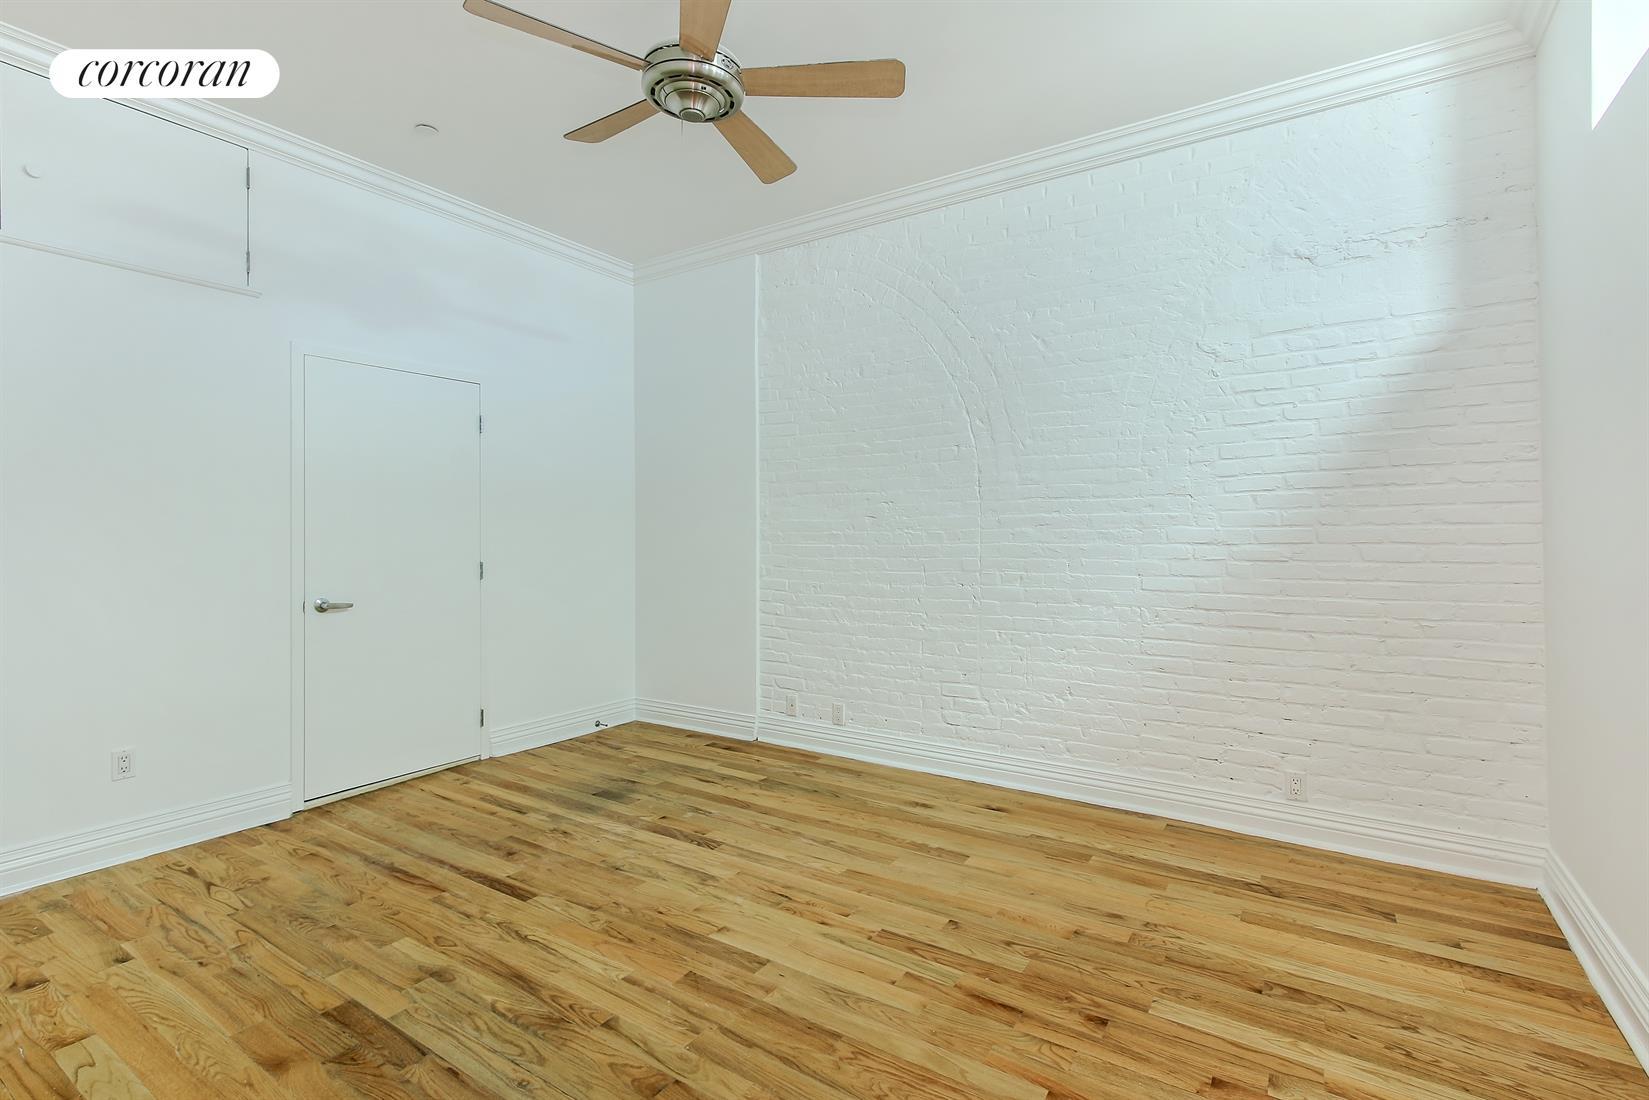 Corcoran, 25 MURRAY ST, Apt. 4G, Tribeca Rentals, Manhattan Rentals ...